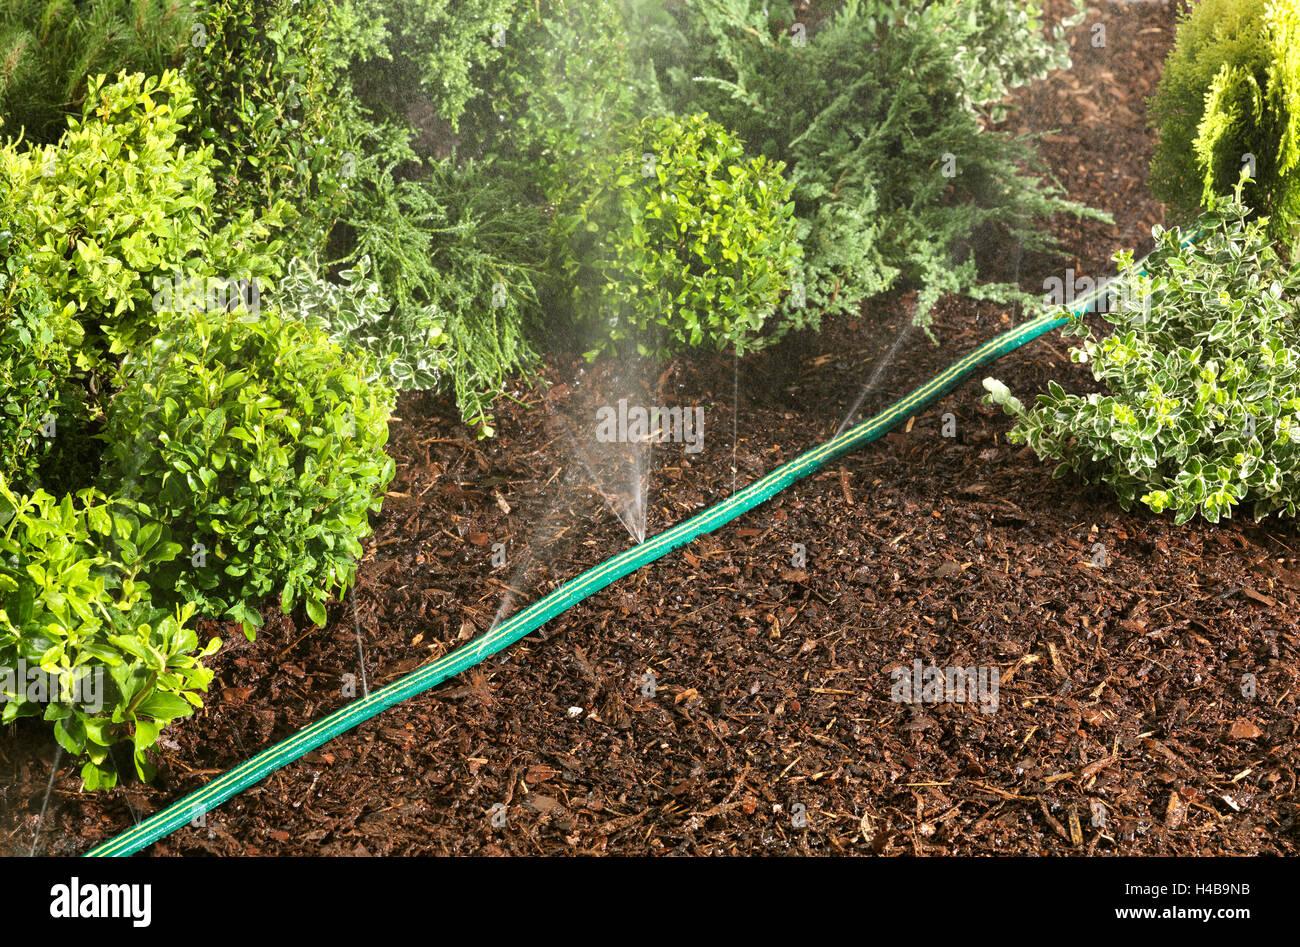 Sprinkler Hose Garden Patch Water Stock Photos & Sprinkler Hose ...